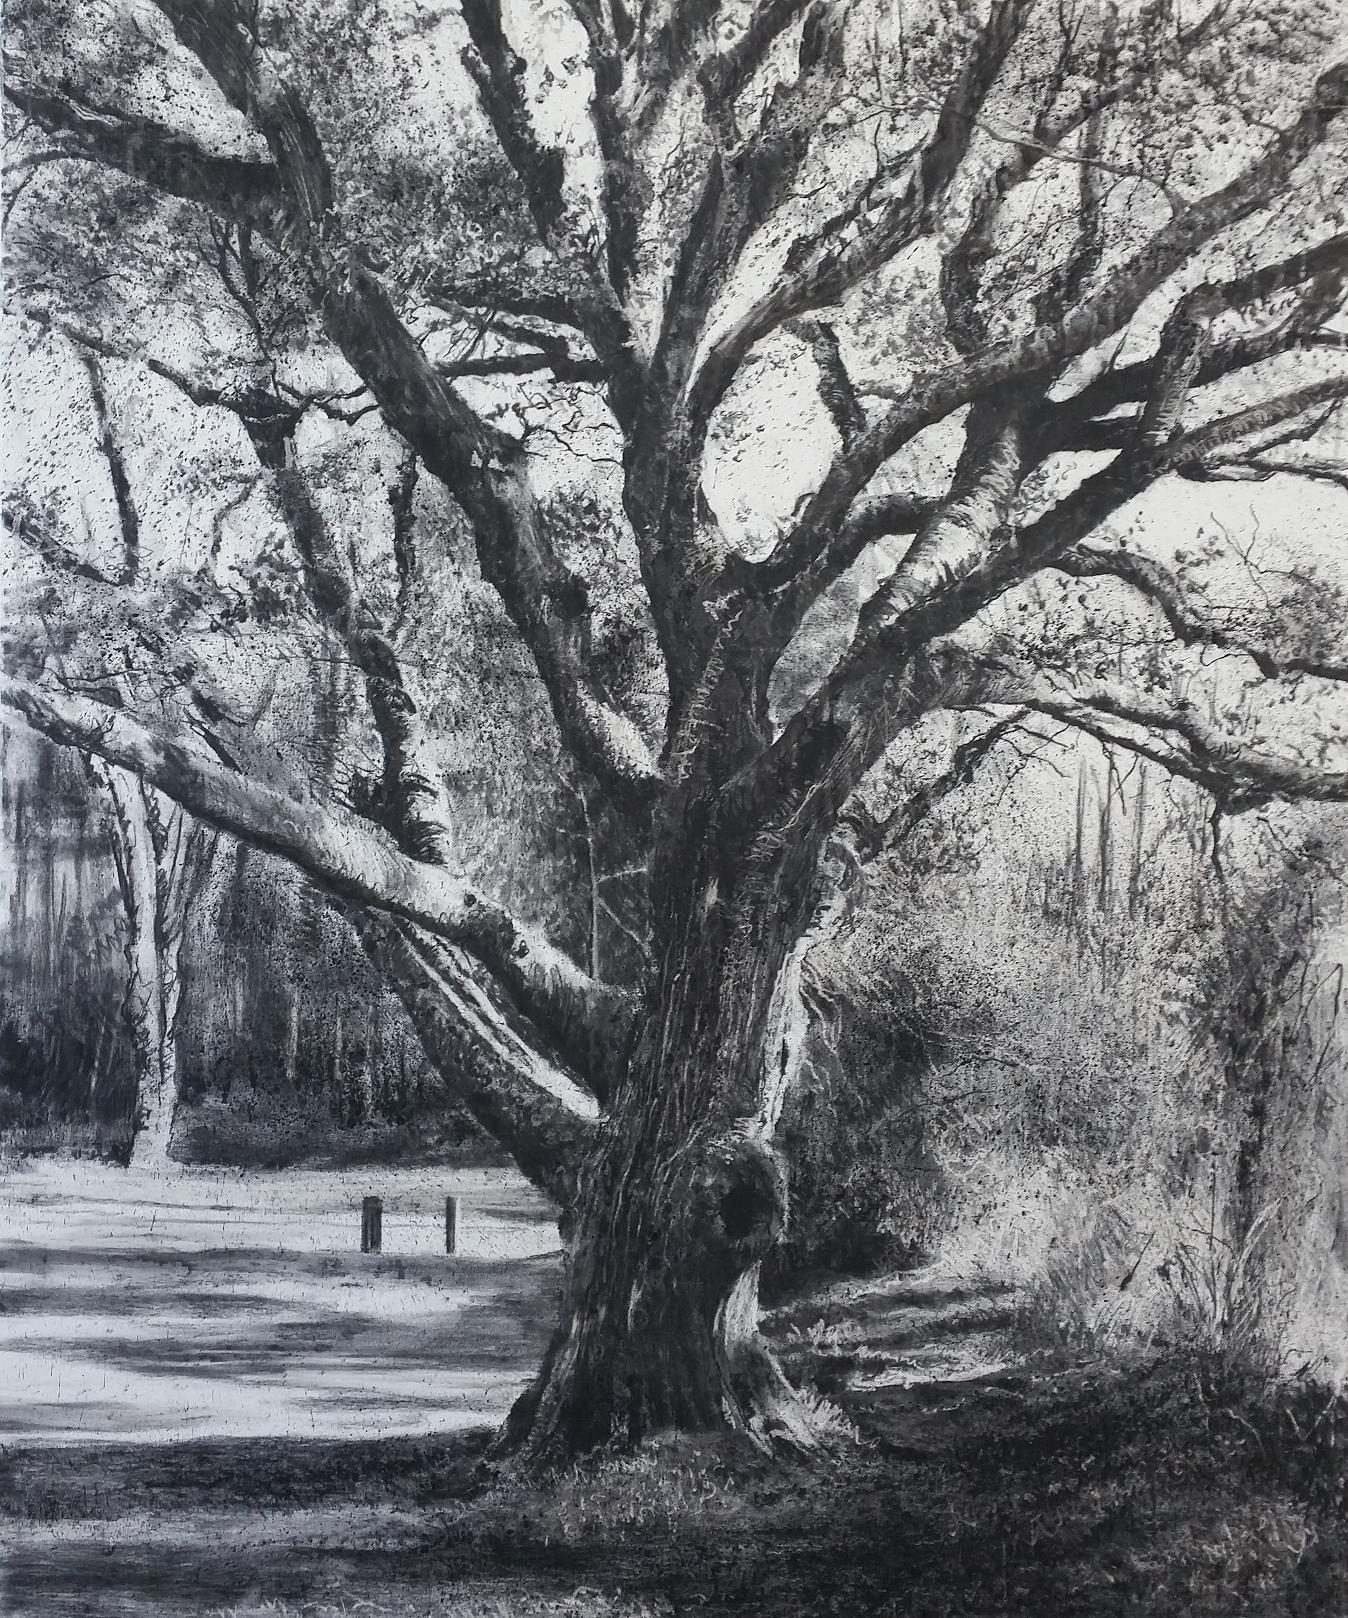 'memory tree' by Michael Wann at the chimera gallery, Mullingar, Co Westmeath, Ireland